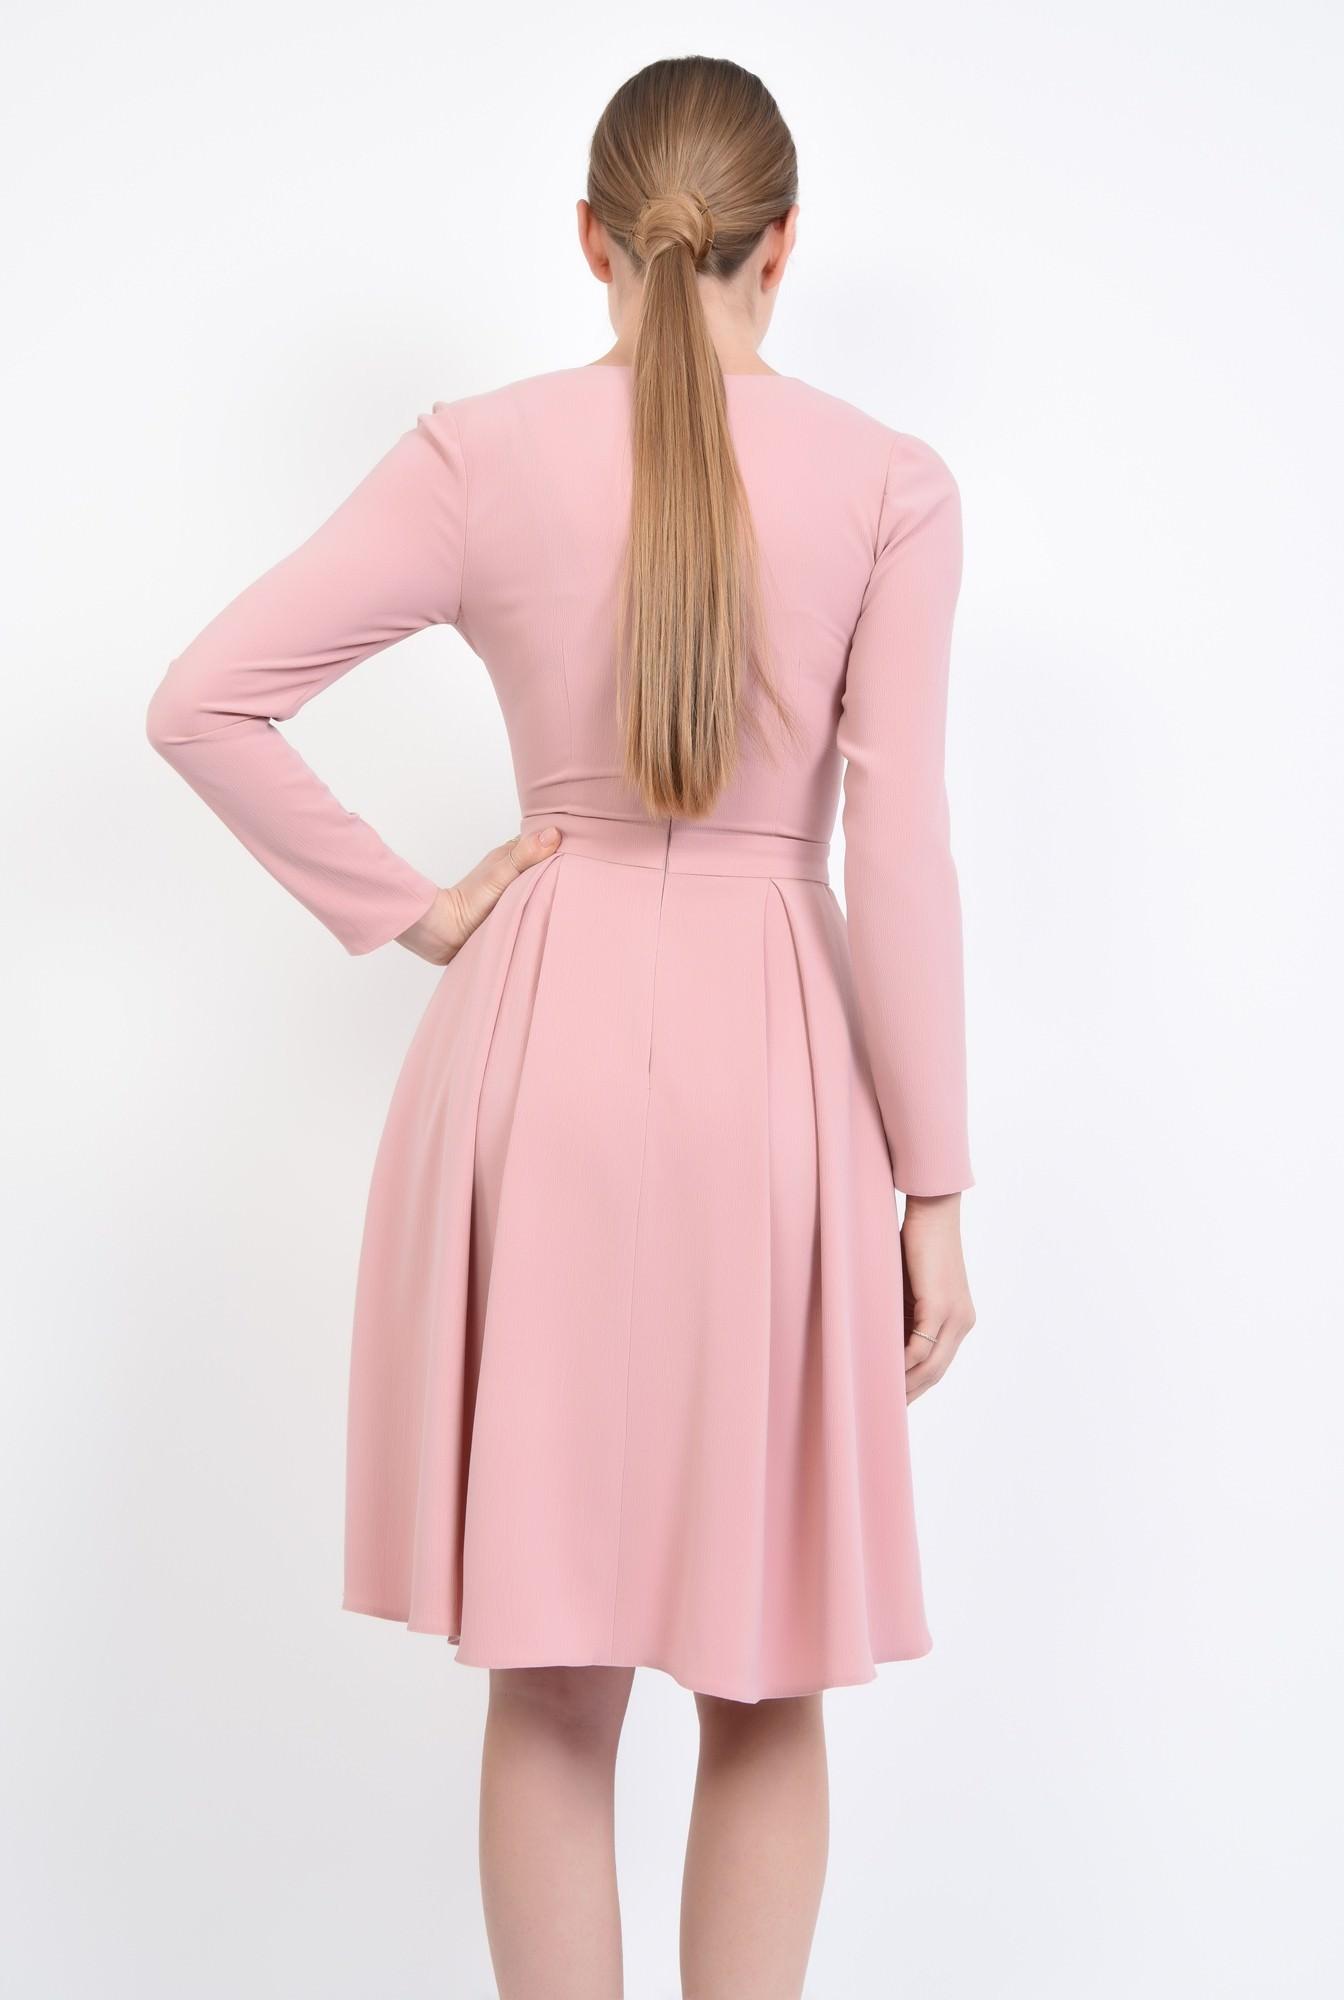 1 - Rochie de zi evazata, roz